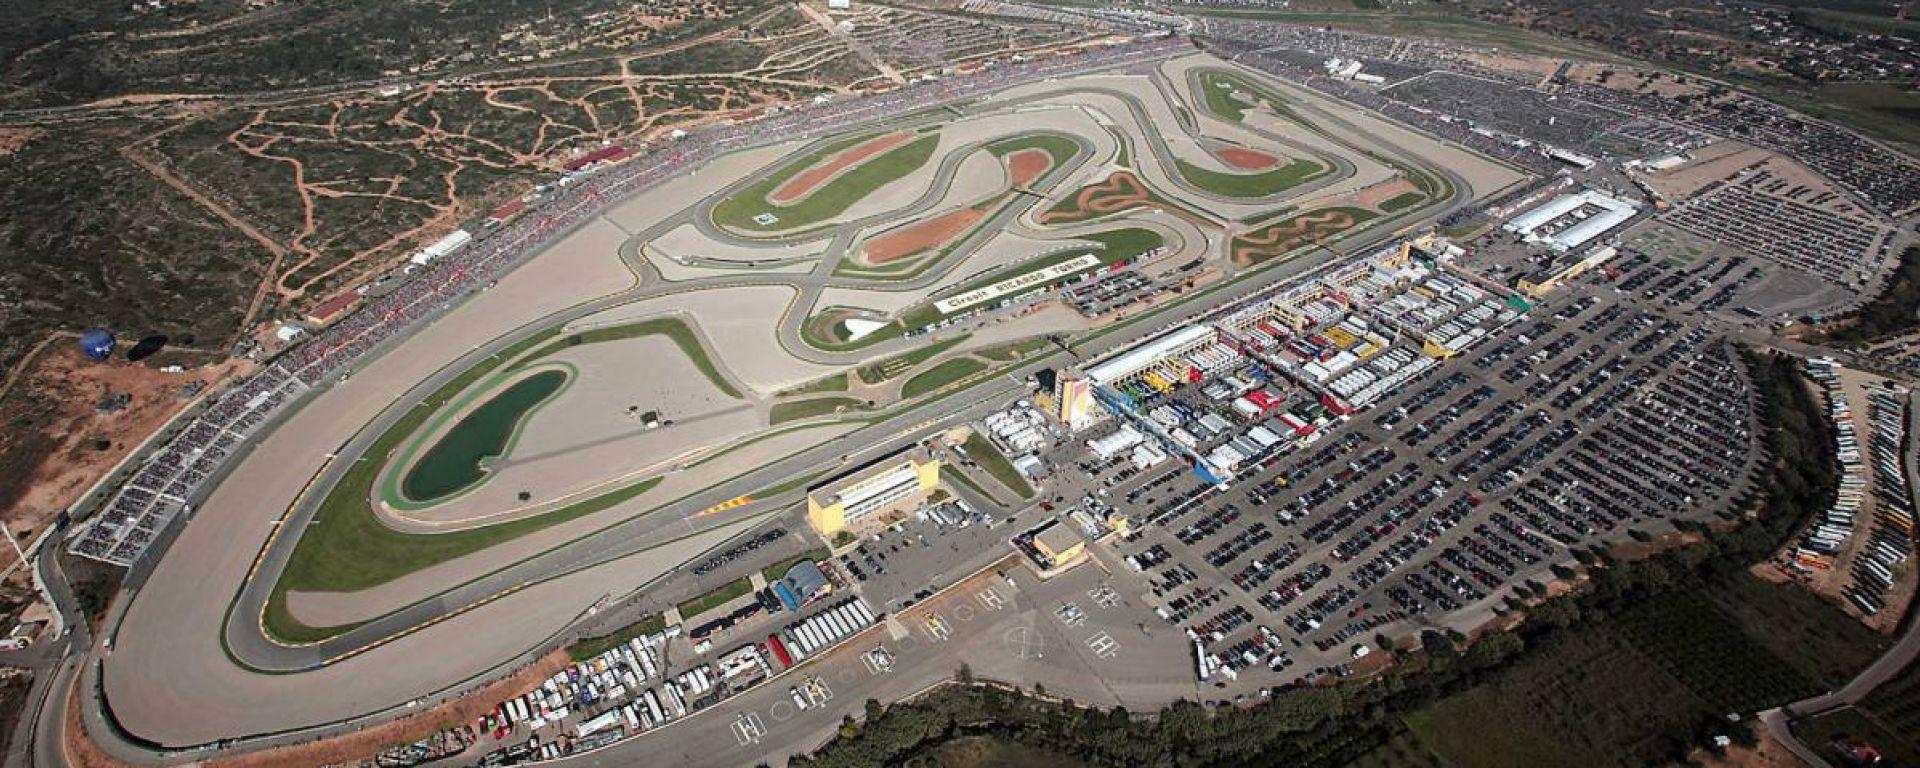 Circuito Ricardo Tormo di Valencia Cheste